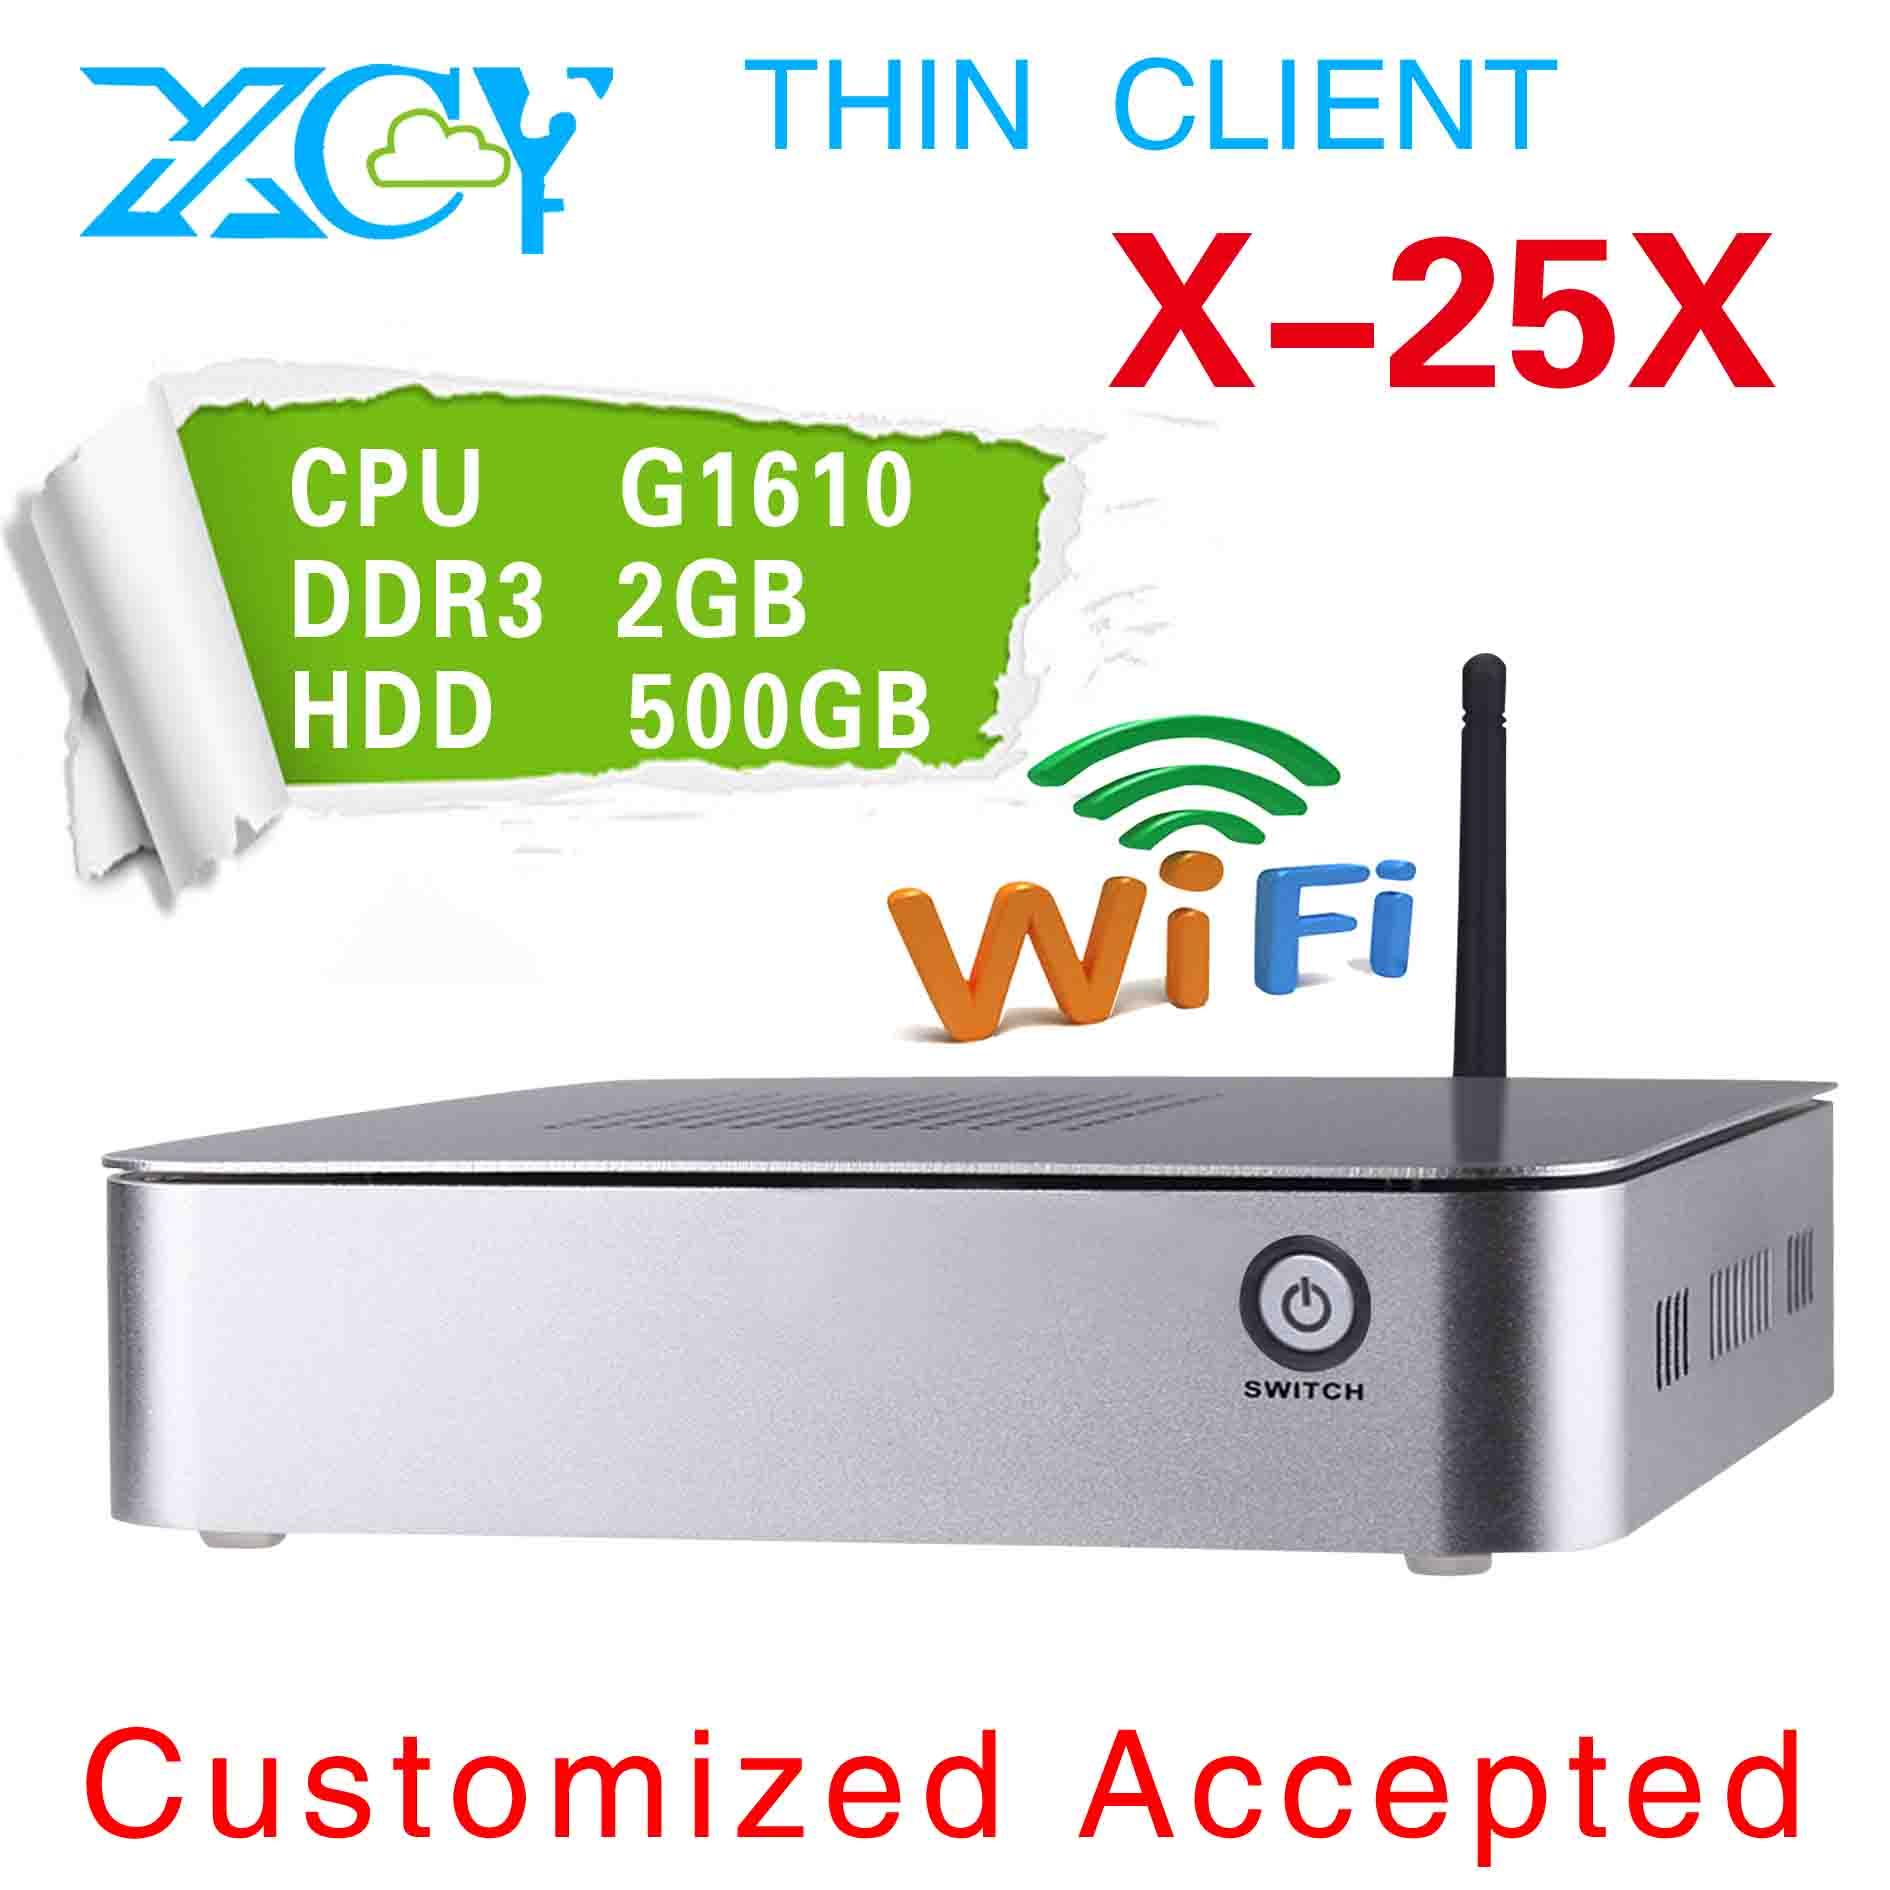 XCY X-25X pc station linux Multimedia Ncomputing OS Supported WIN7, Linux, Windows 95, Windows 98, etc.(China (Mainland))